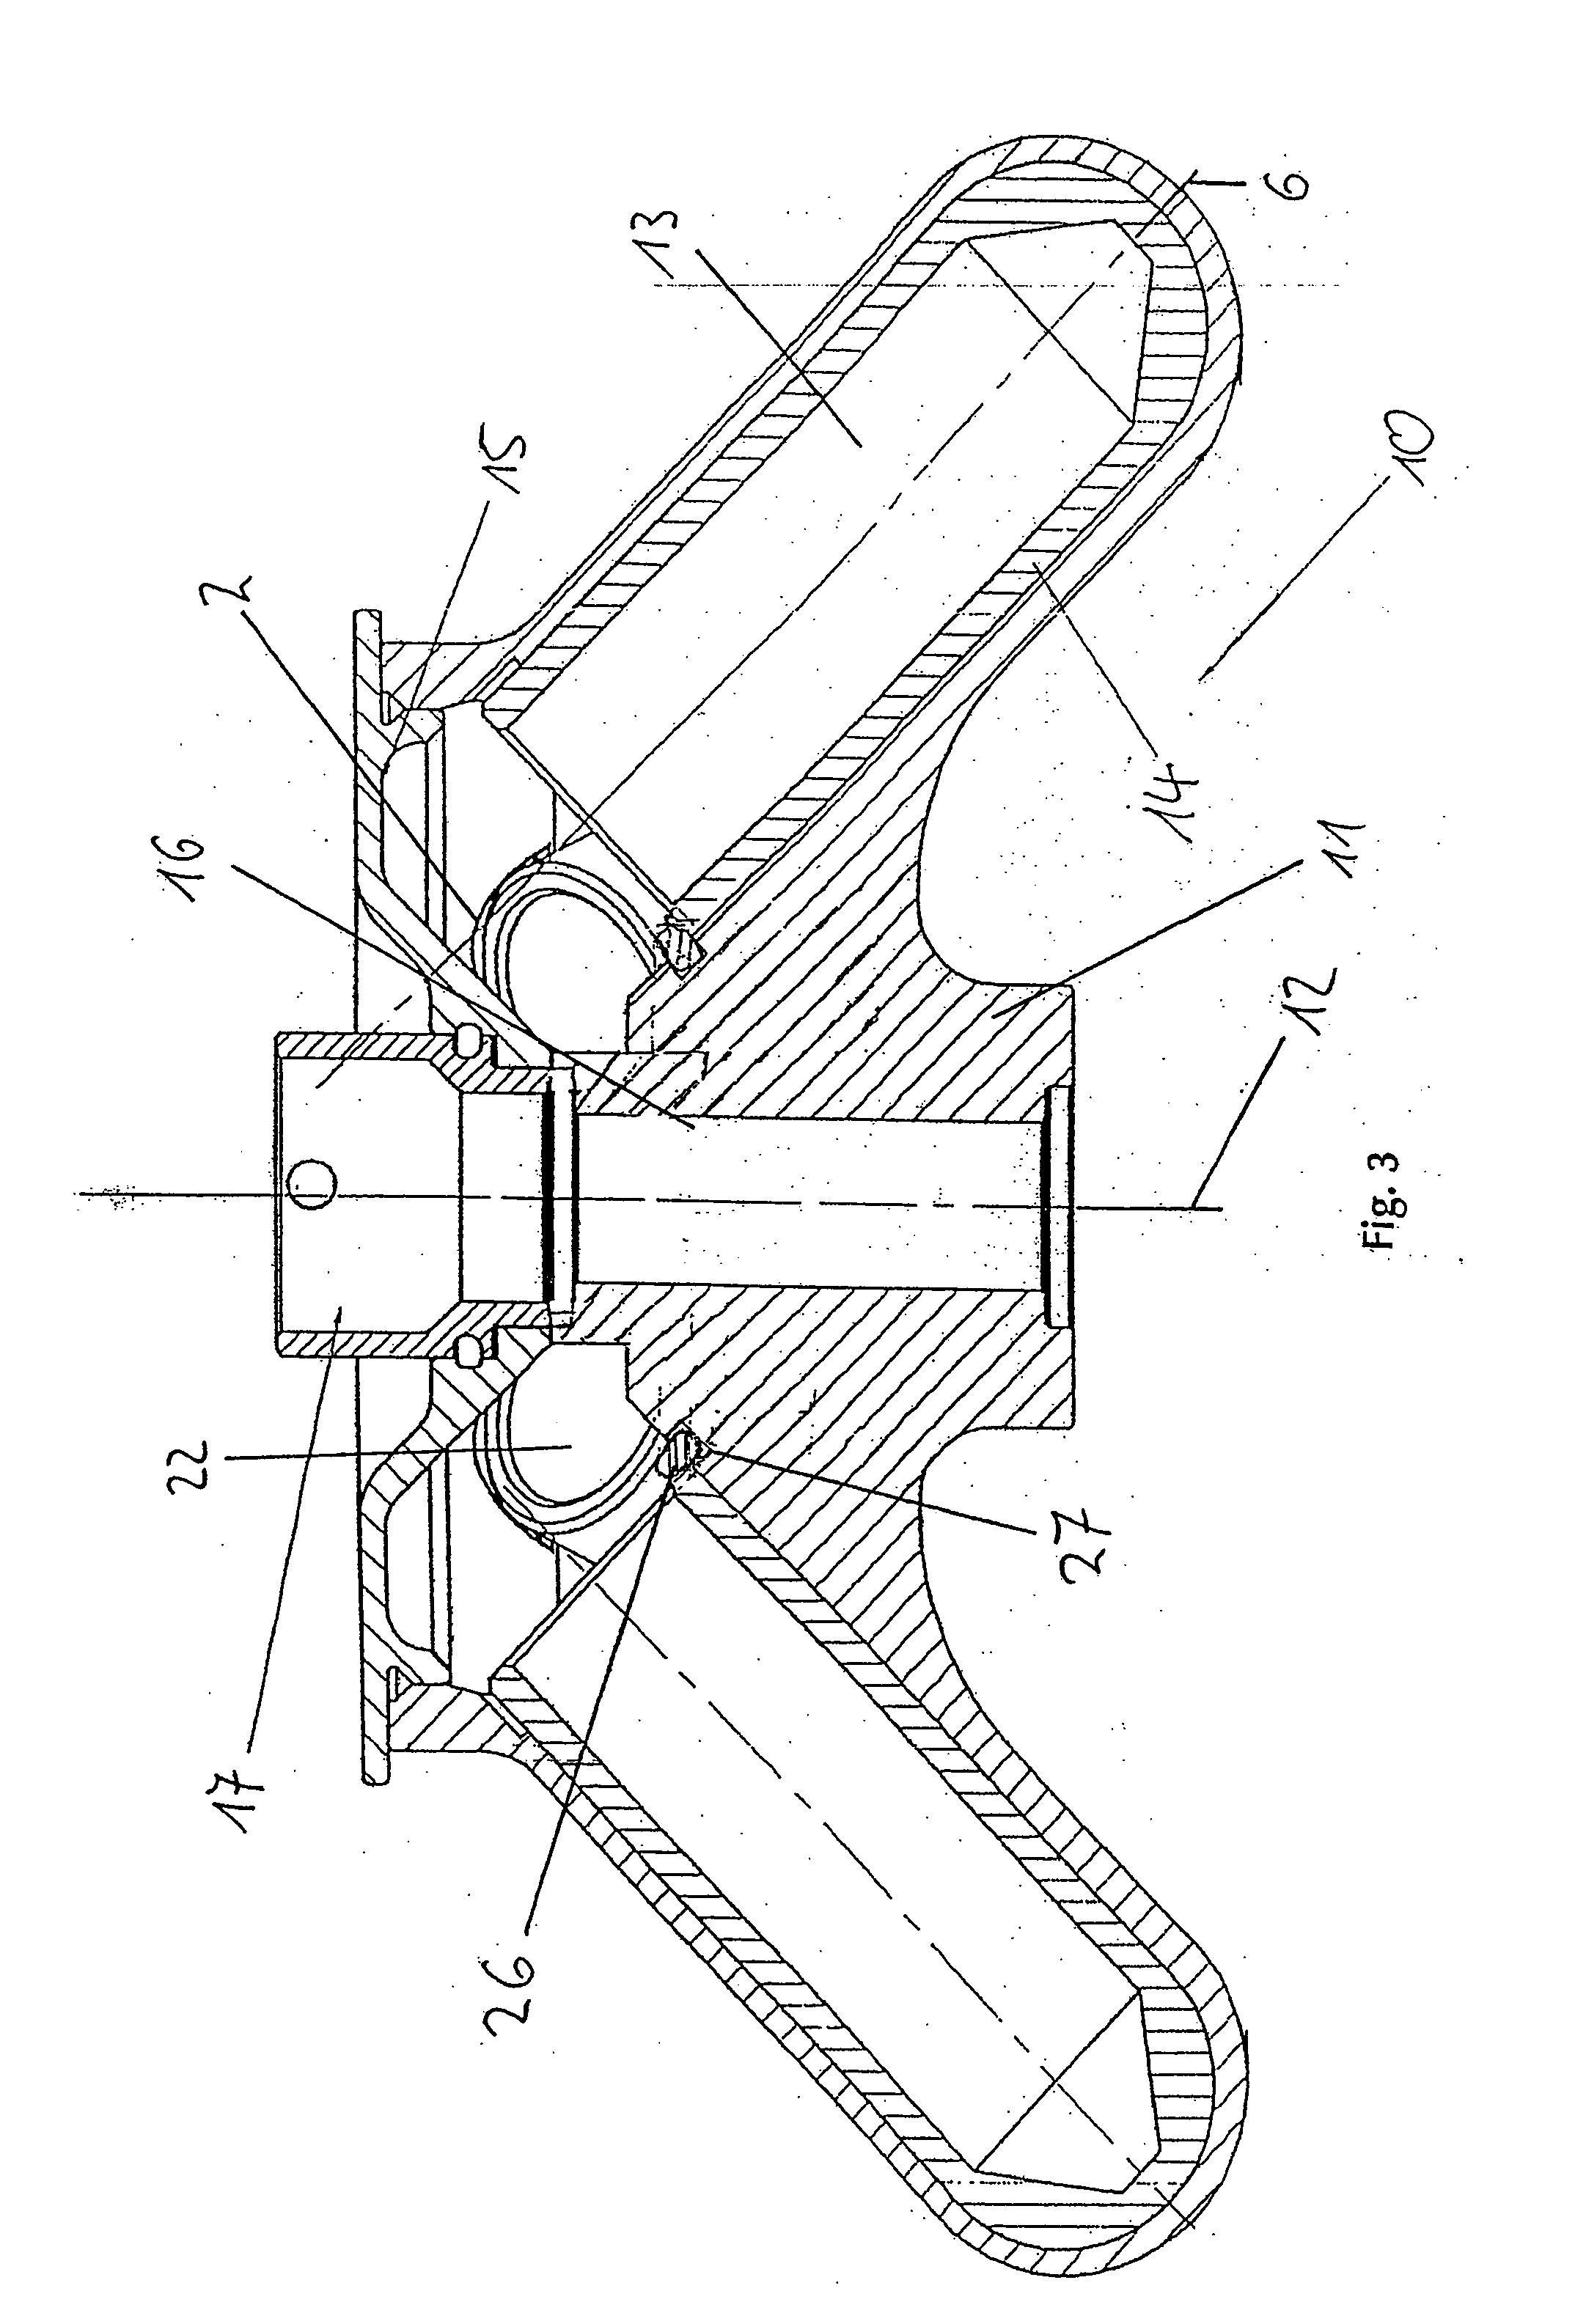 Inncom E528 Wiring Diagram Room Library Pdf Patent Drawing